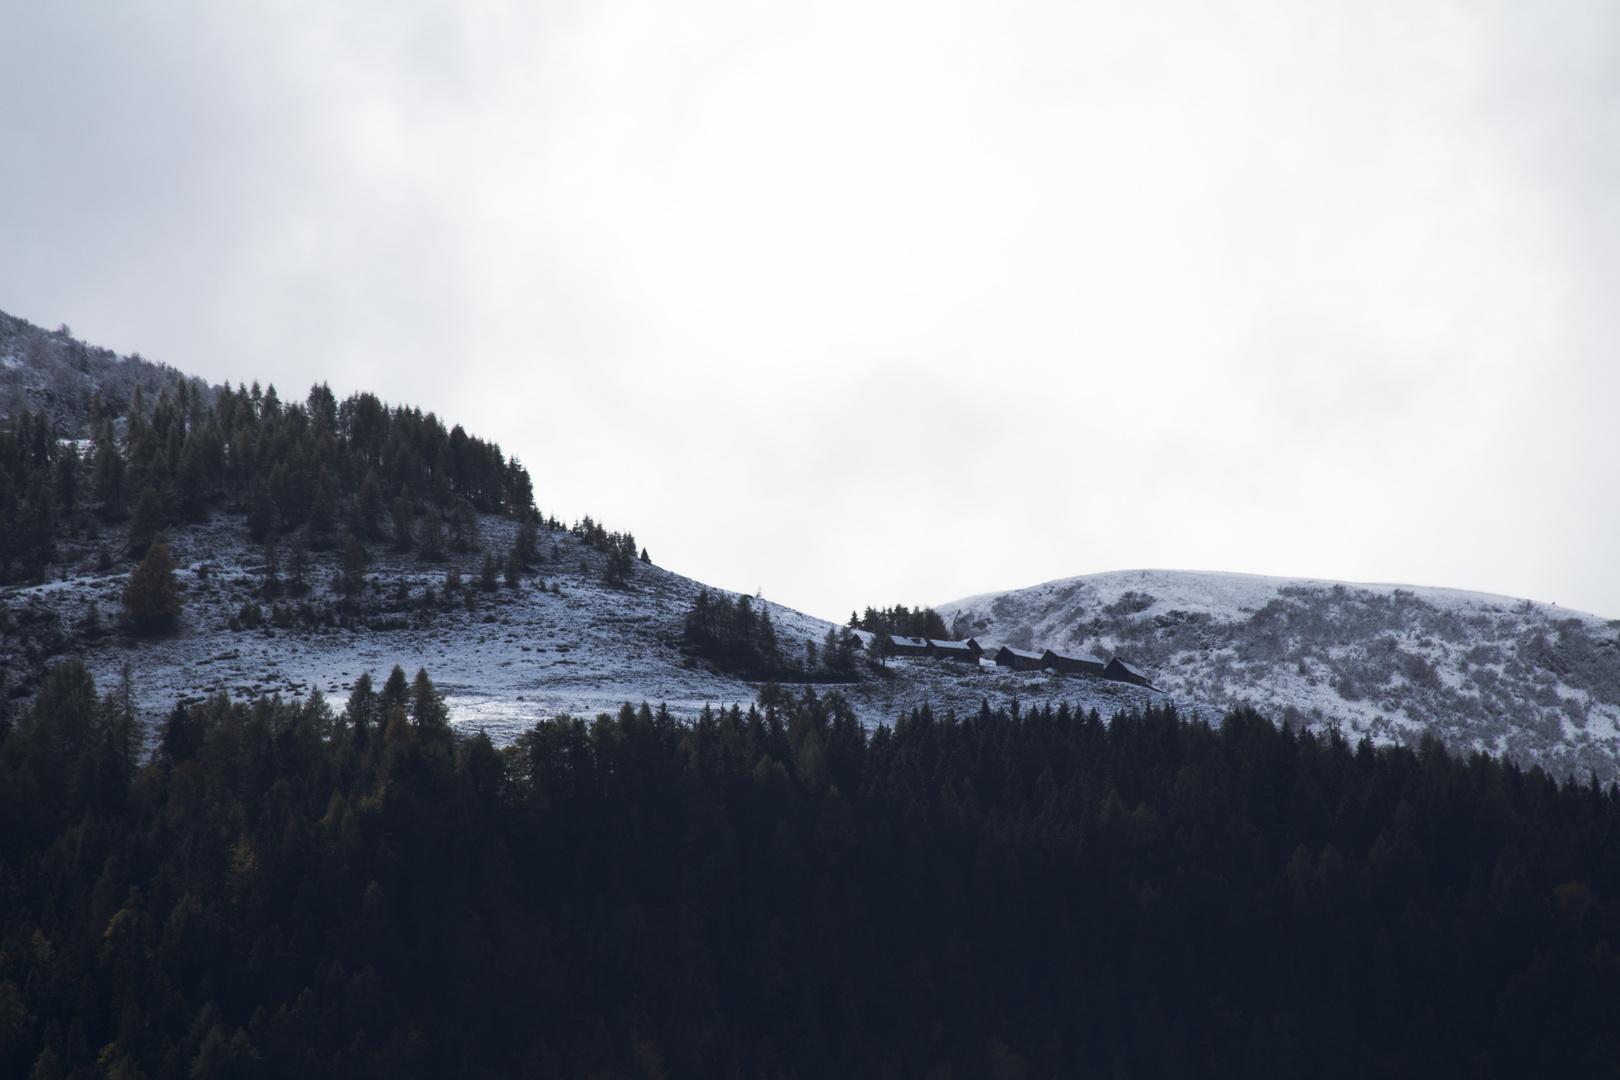 Winter is coming soon...